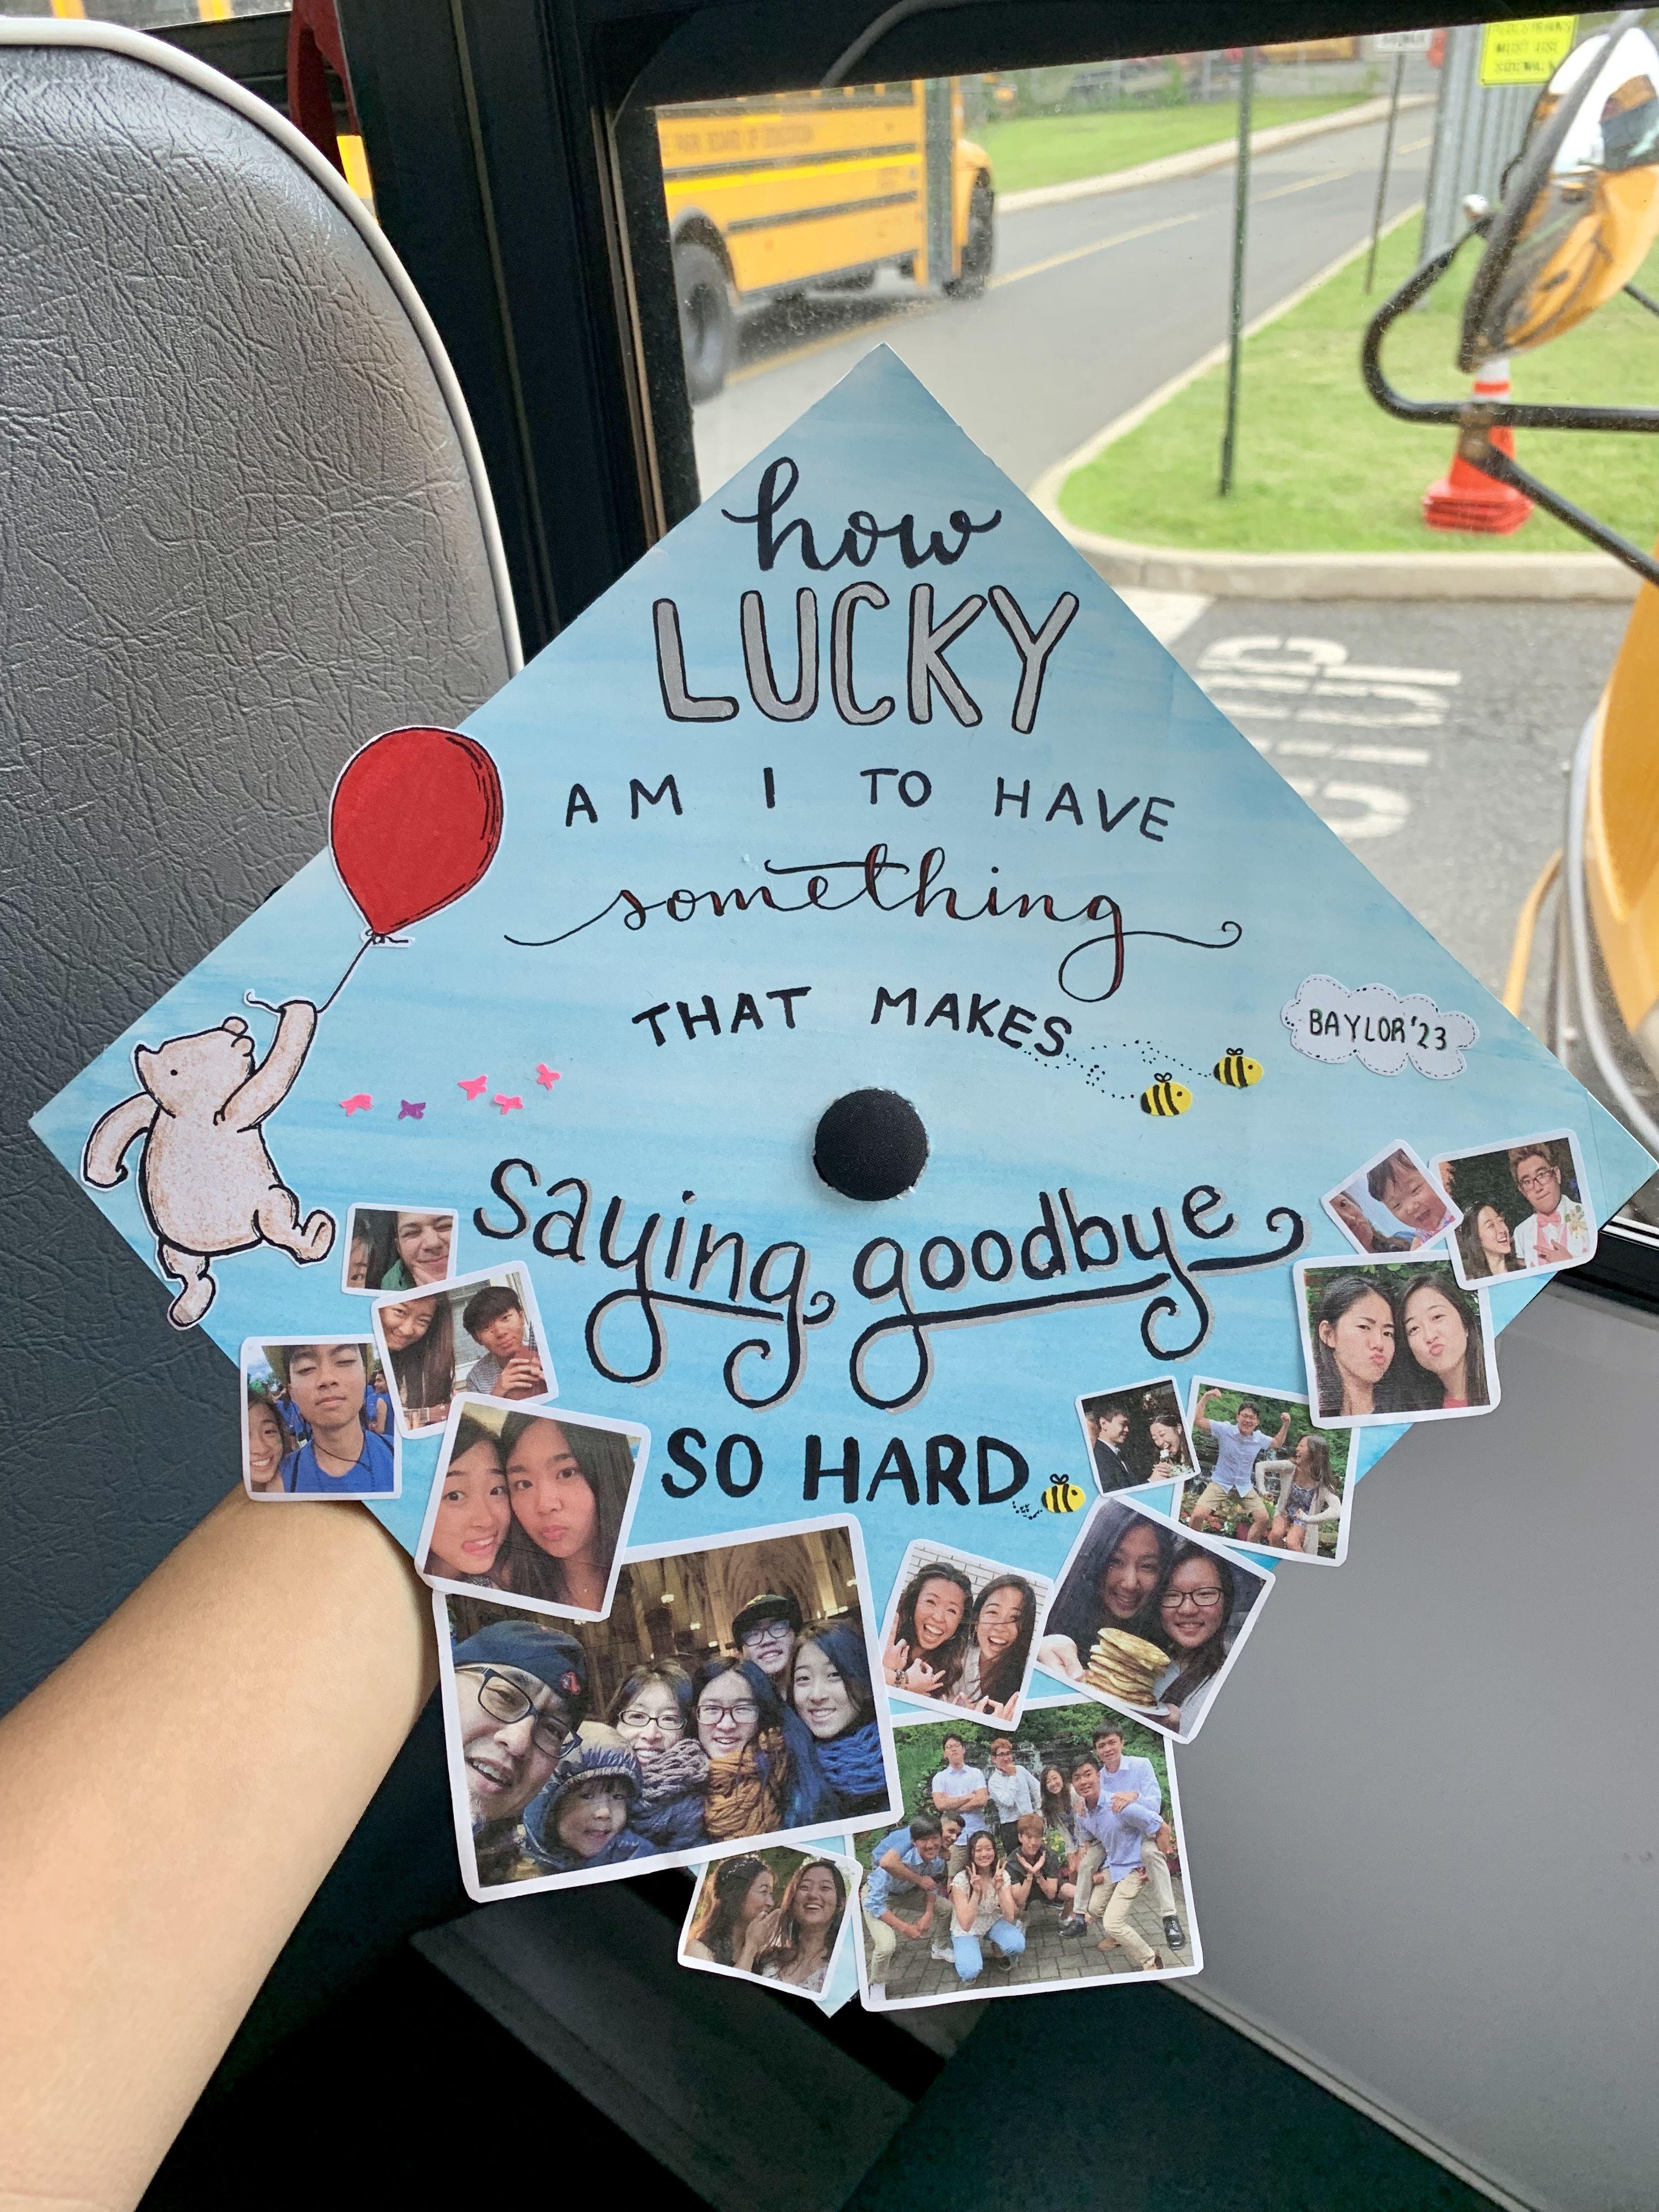 winnie the pooh graduation cap:)